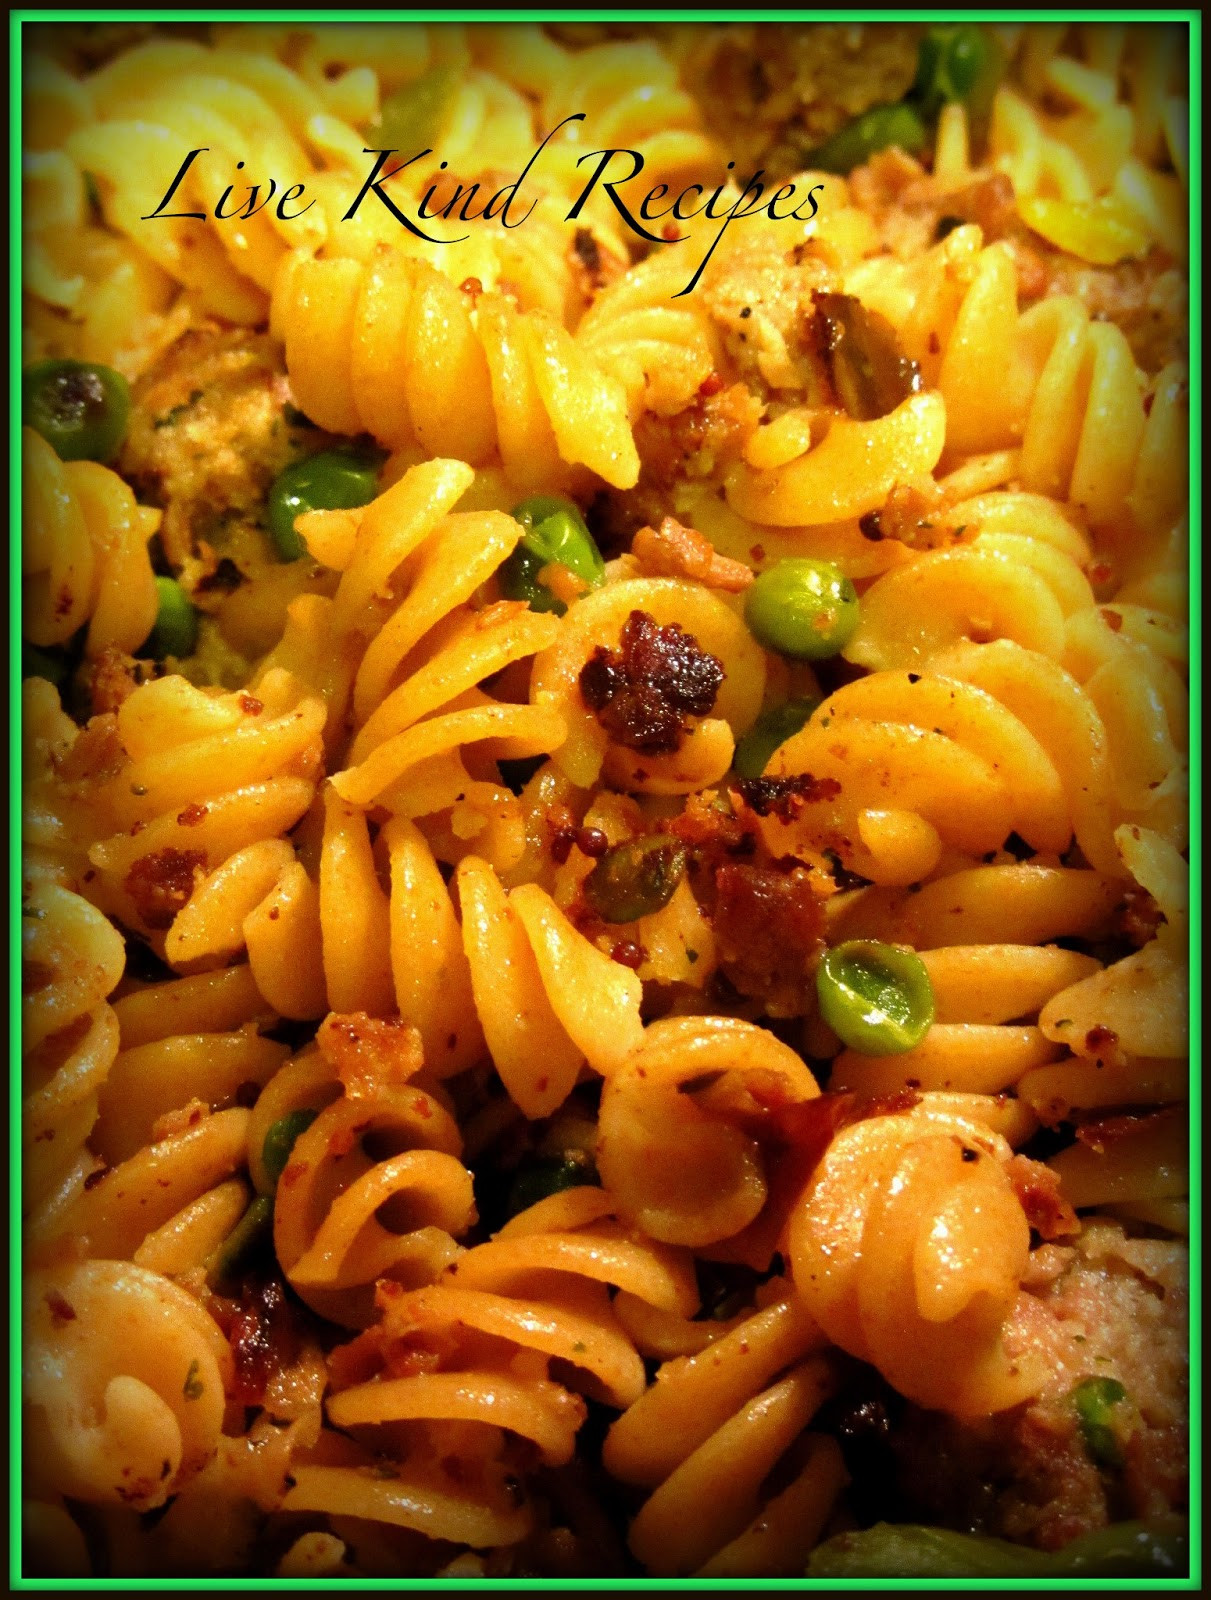 Quick And Easy Vegan Recipes  LIVE KIND RECIPES Vegan Pasta Upma A quick and easy